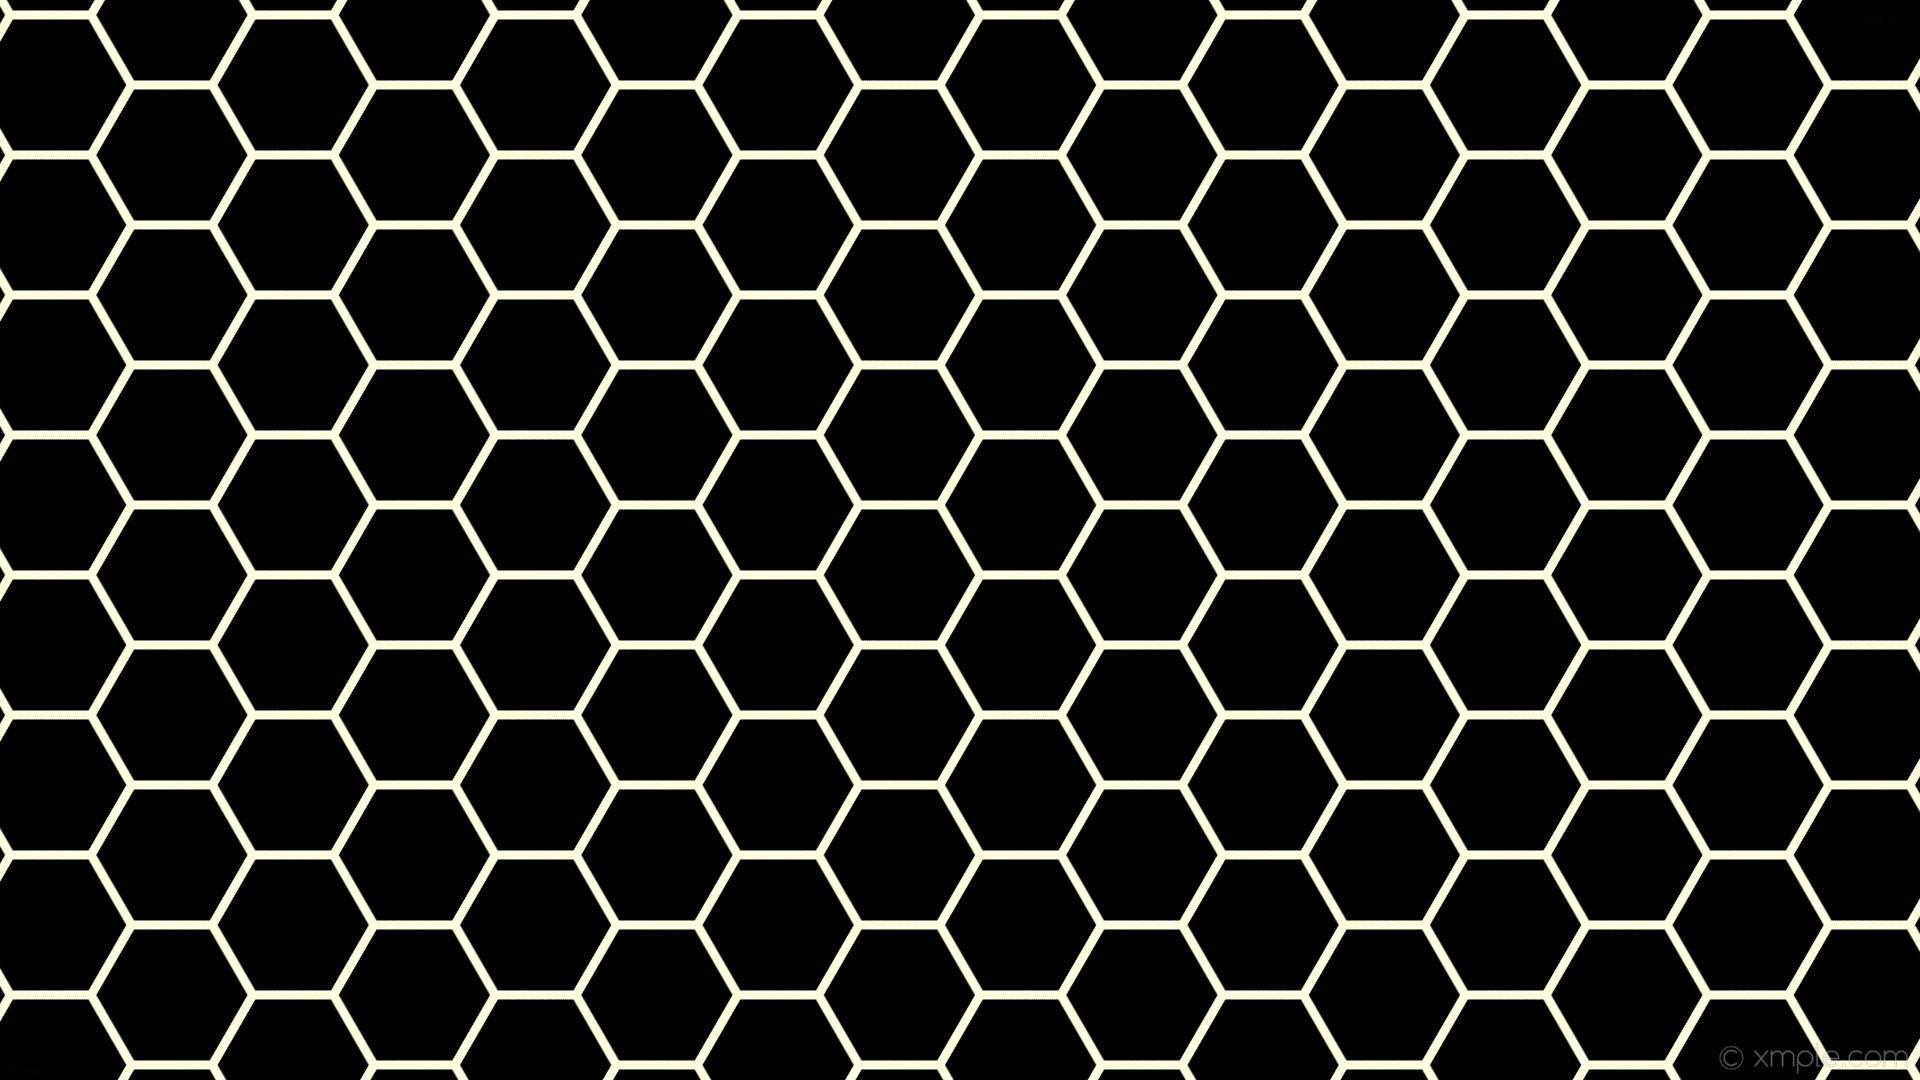 wallpaper beehive honeycomb black hexagon yellow light yellow #000000  #ffffe0 diagonal 30° 9px